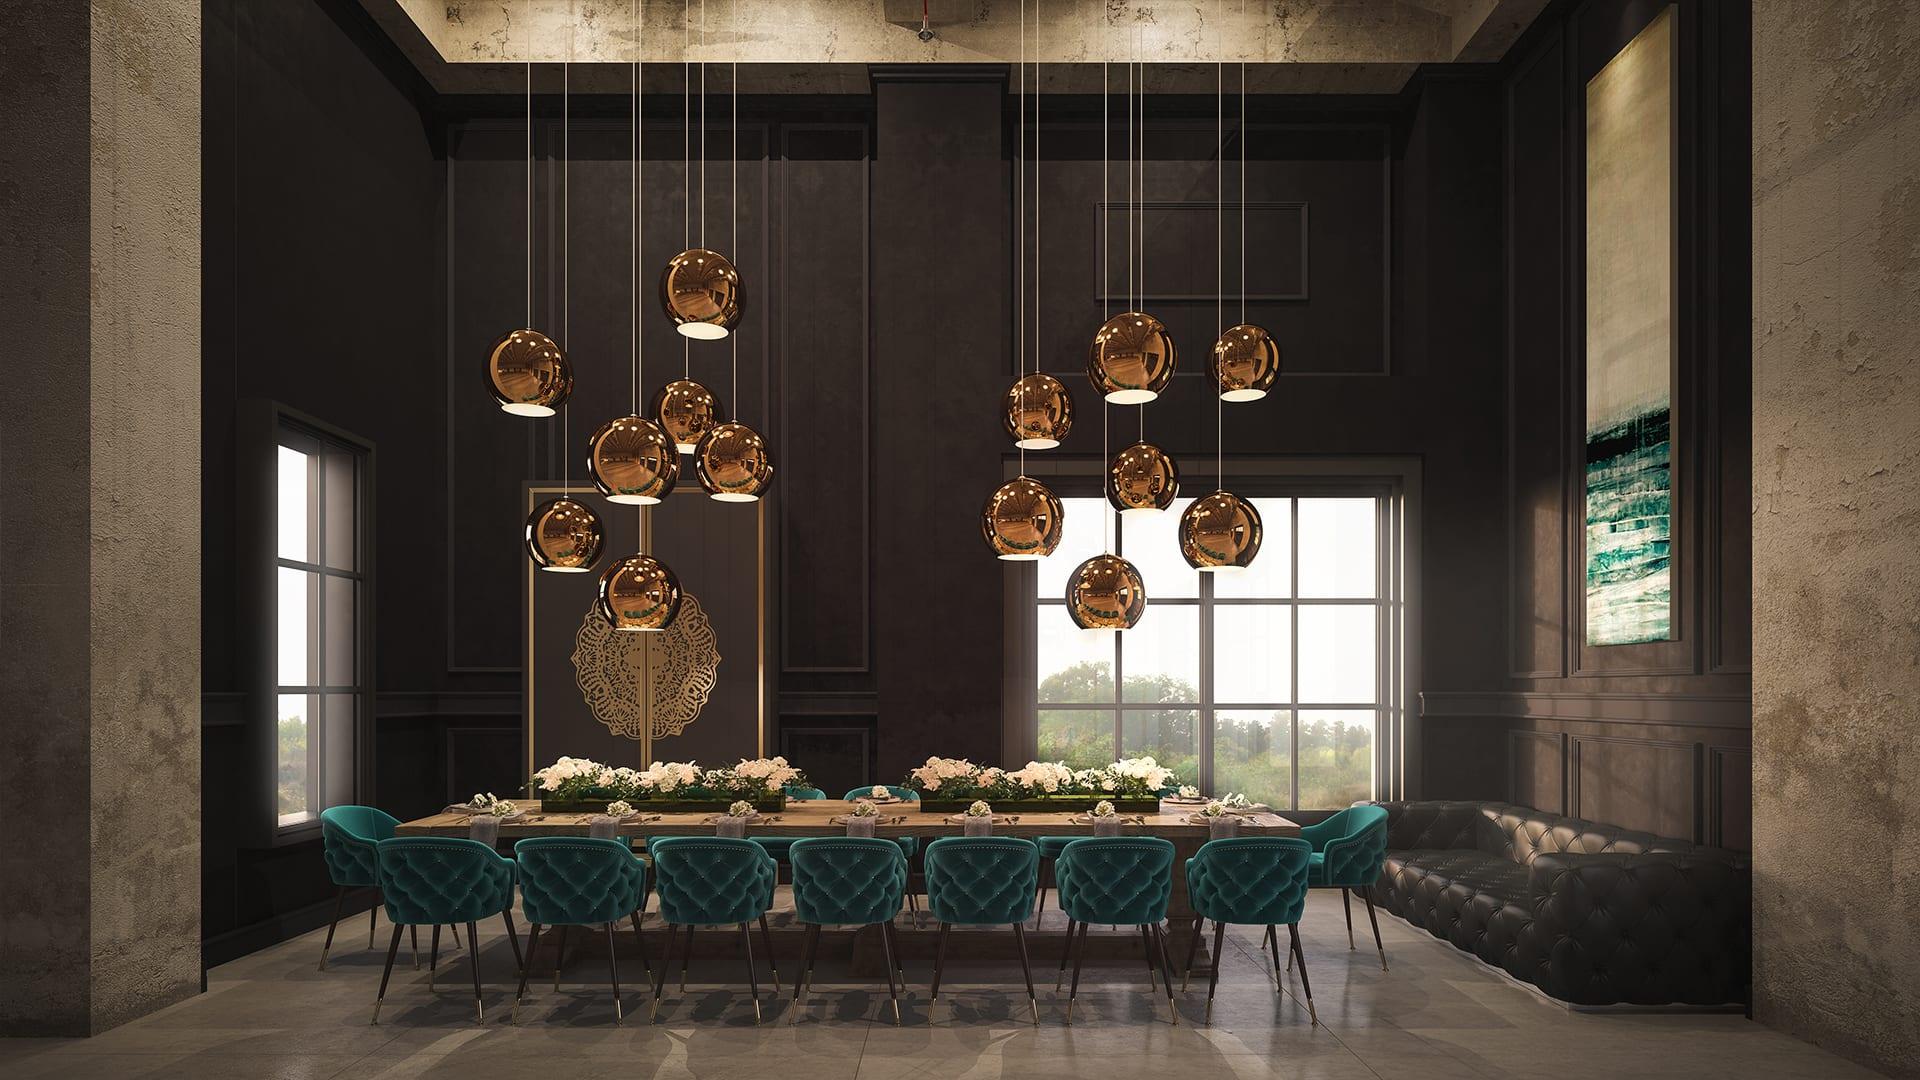 Maayan-Golan_Architectural-Visualization_interior-design-visualization_citrus-events_royal-dining_05